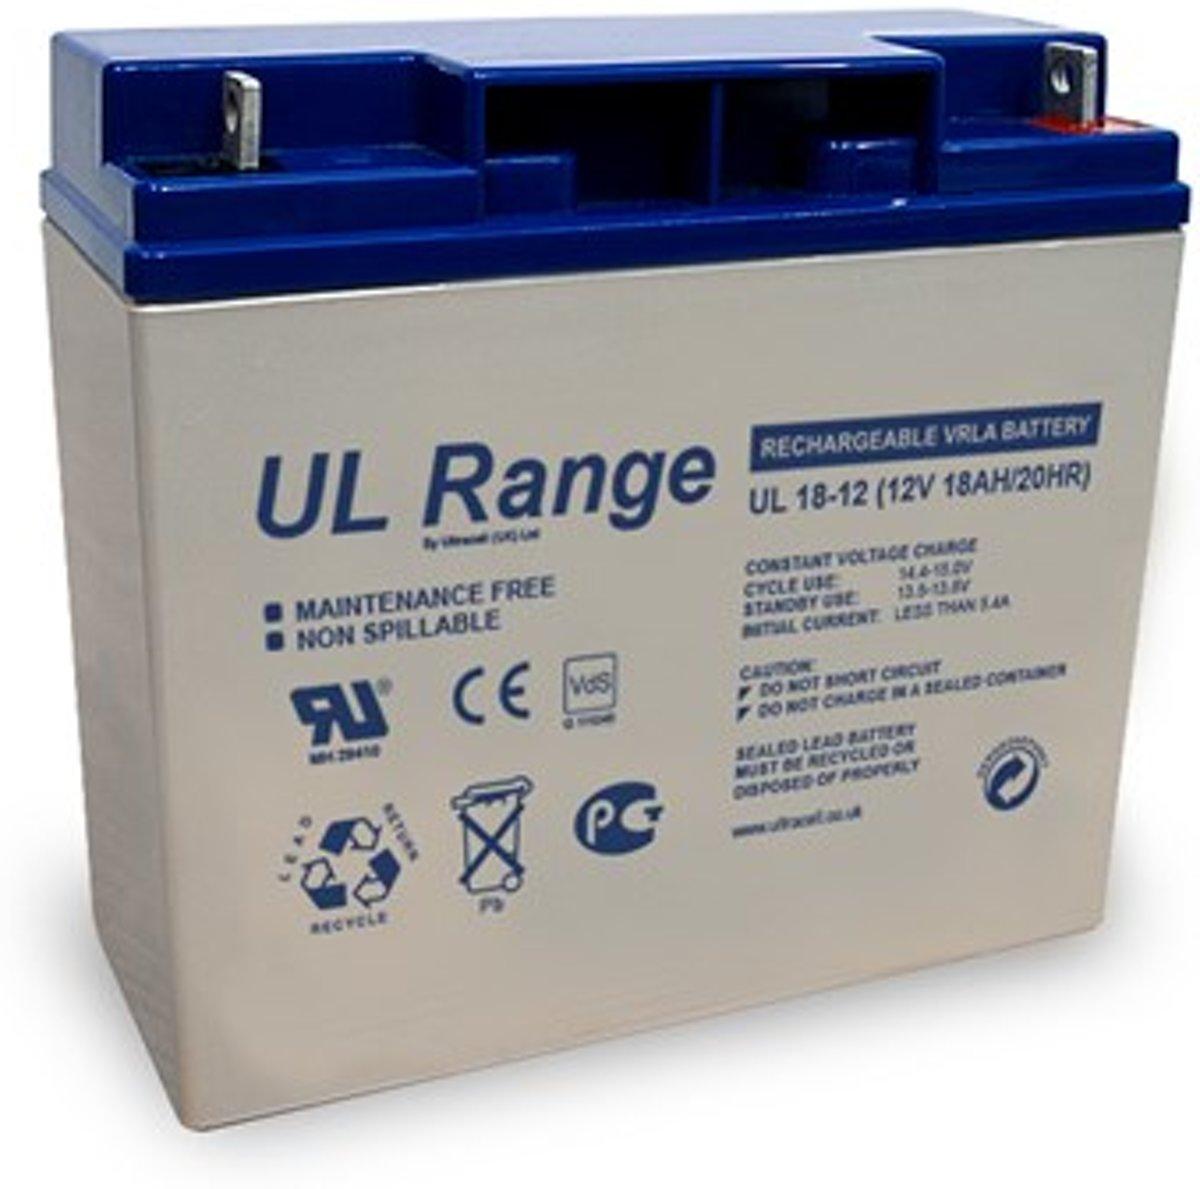 Loodaccu Ultracell UL 12v 18000mAh